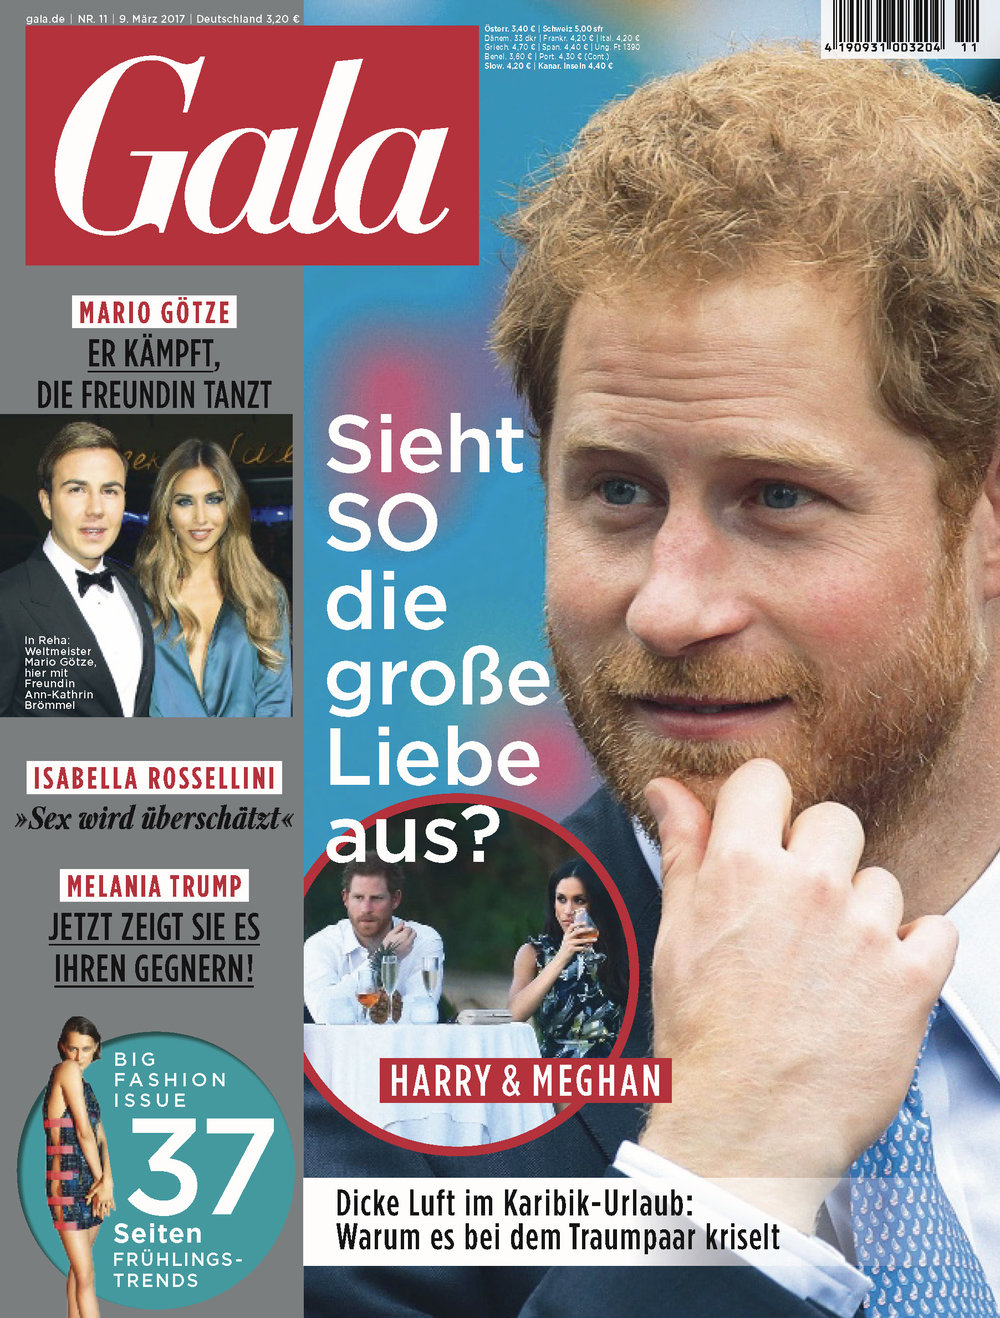 GALA MAGAZINE - March 2017 Cover.jpg